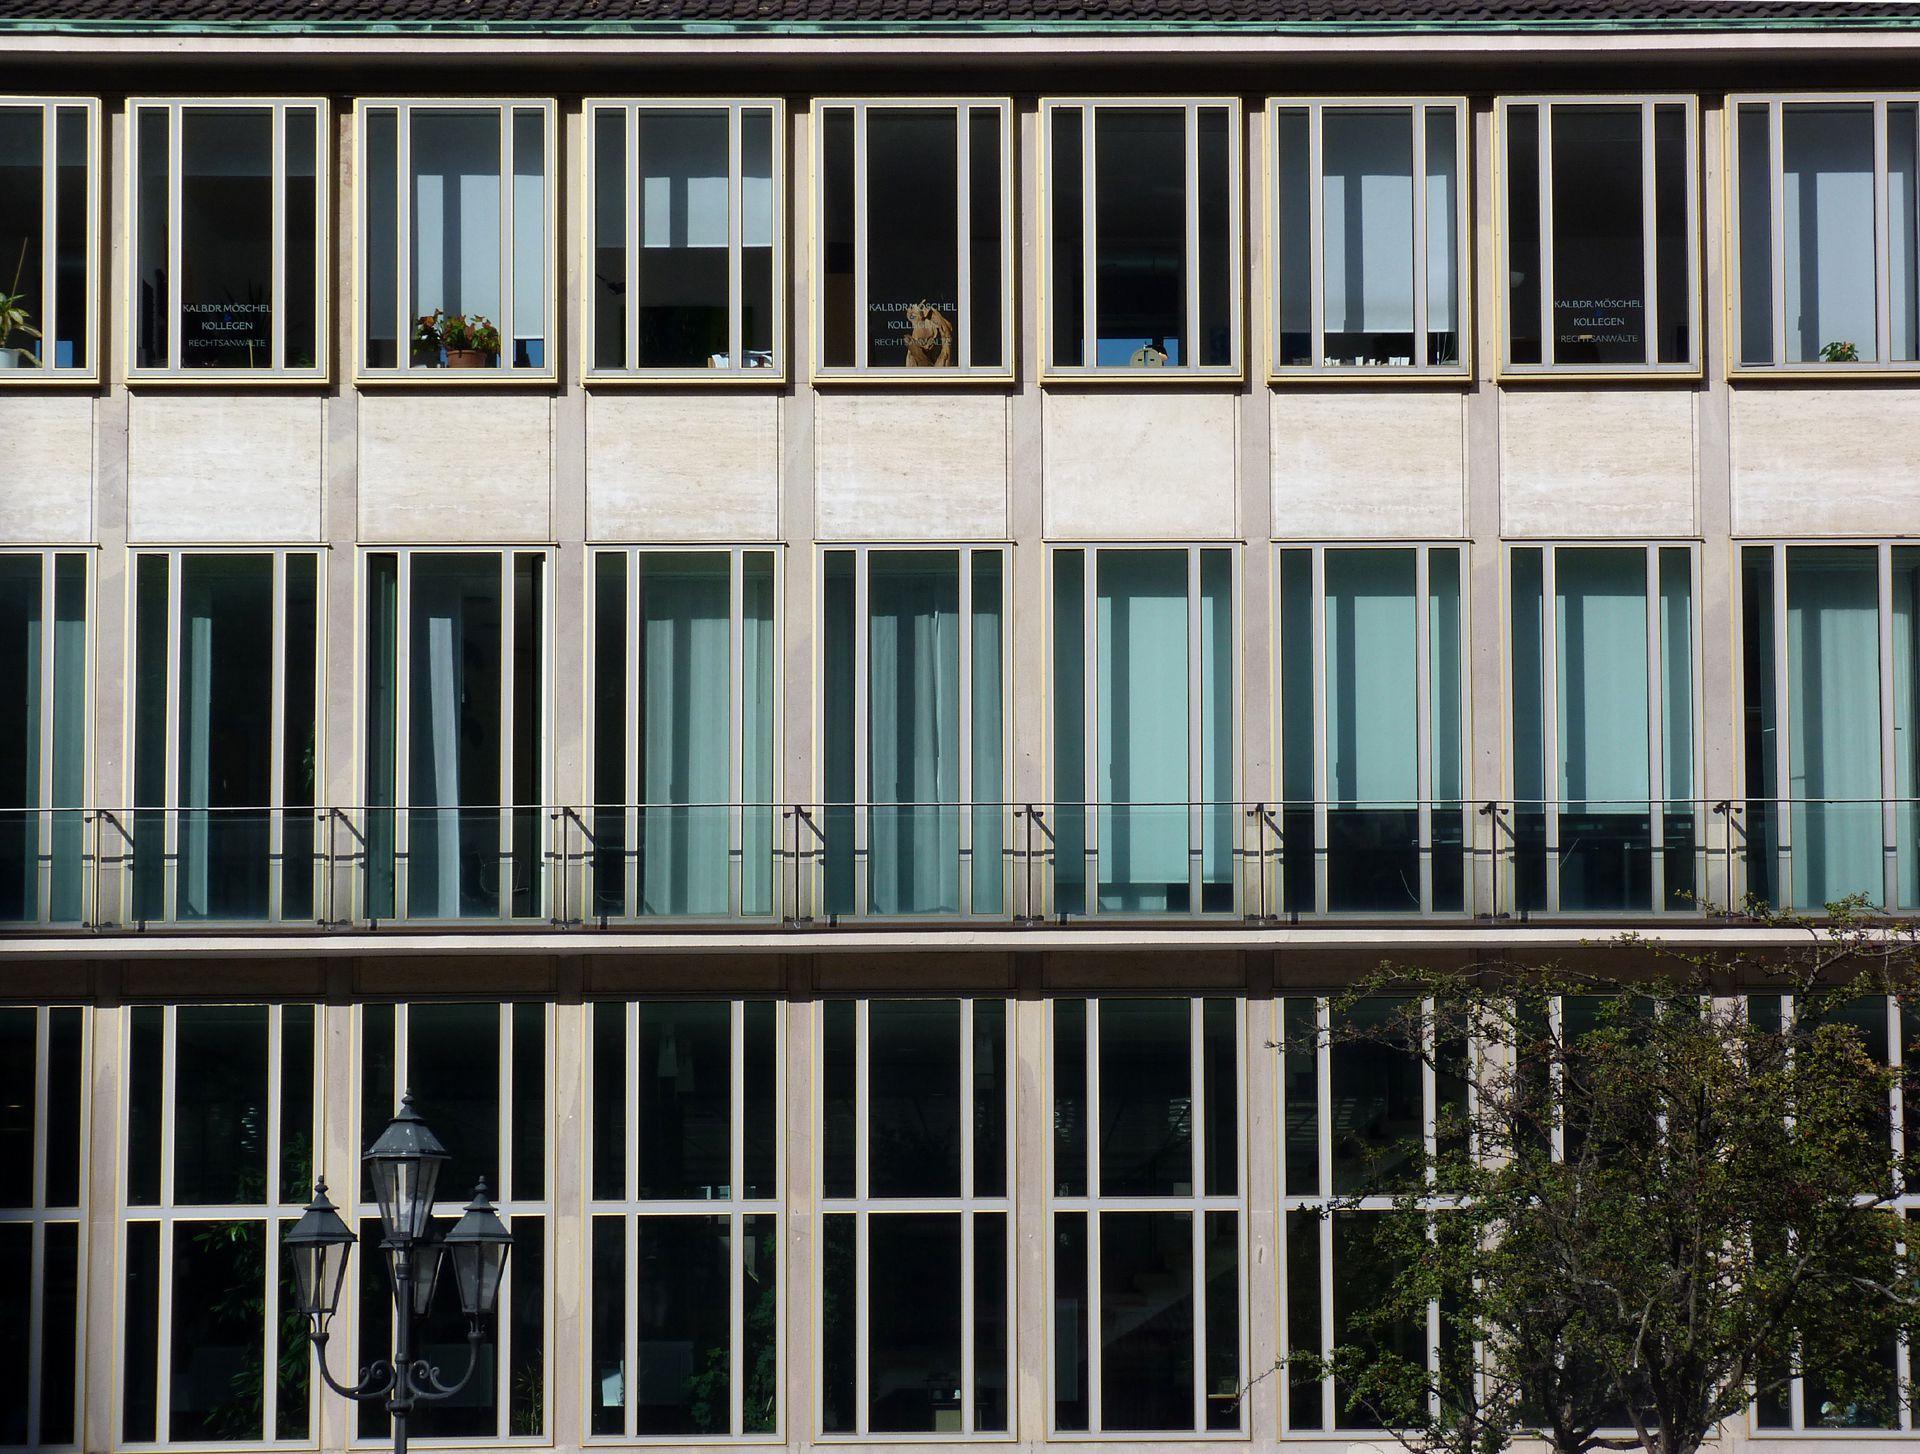 Former Bavarian State Bank Front, detail